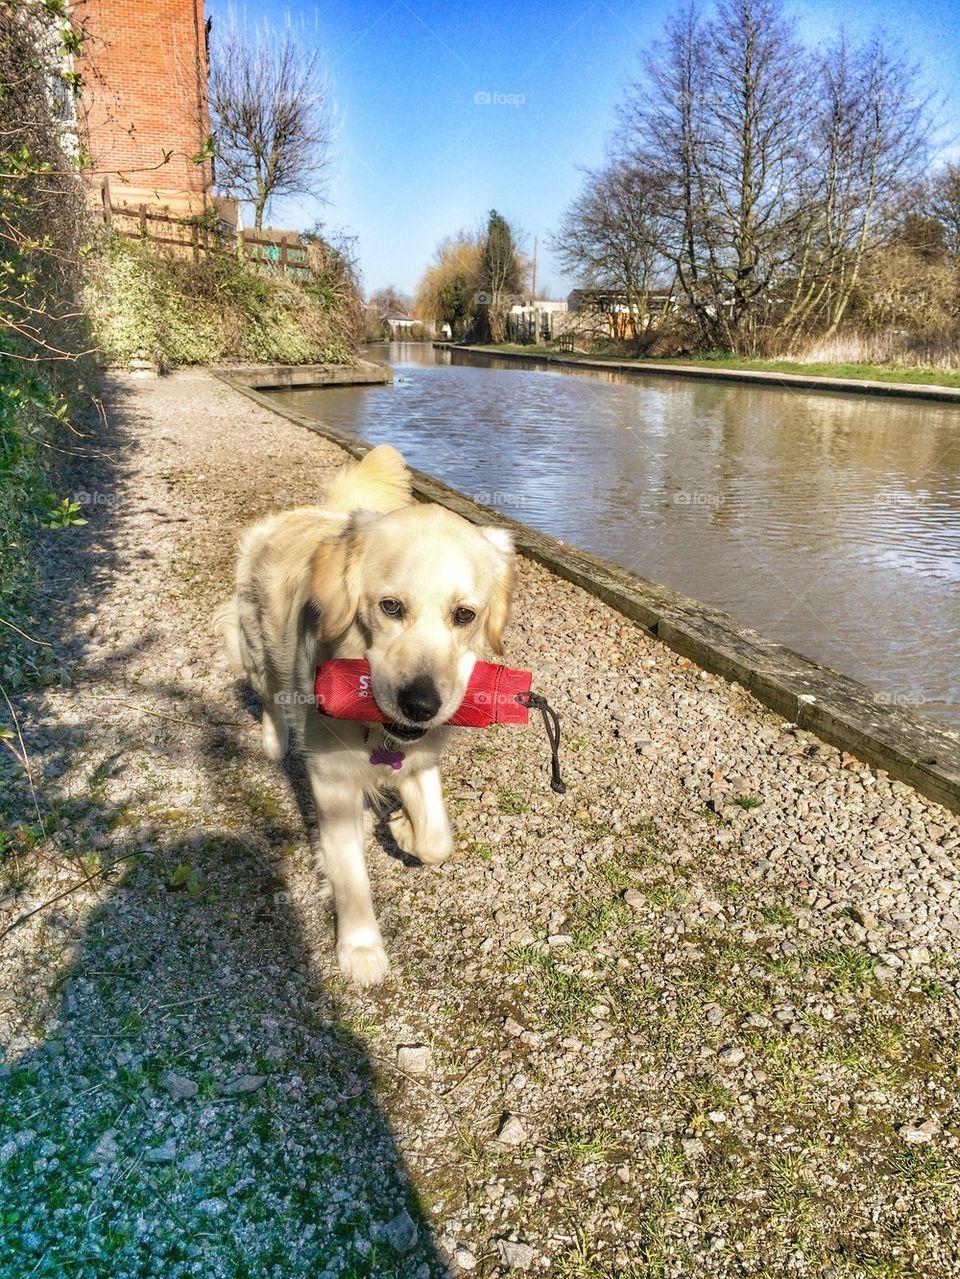 Zoe walking along the canal